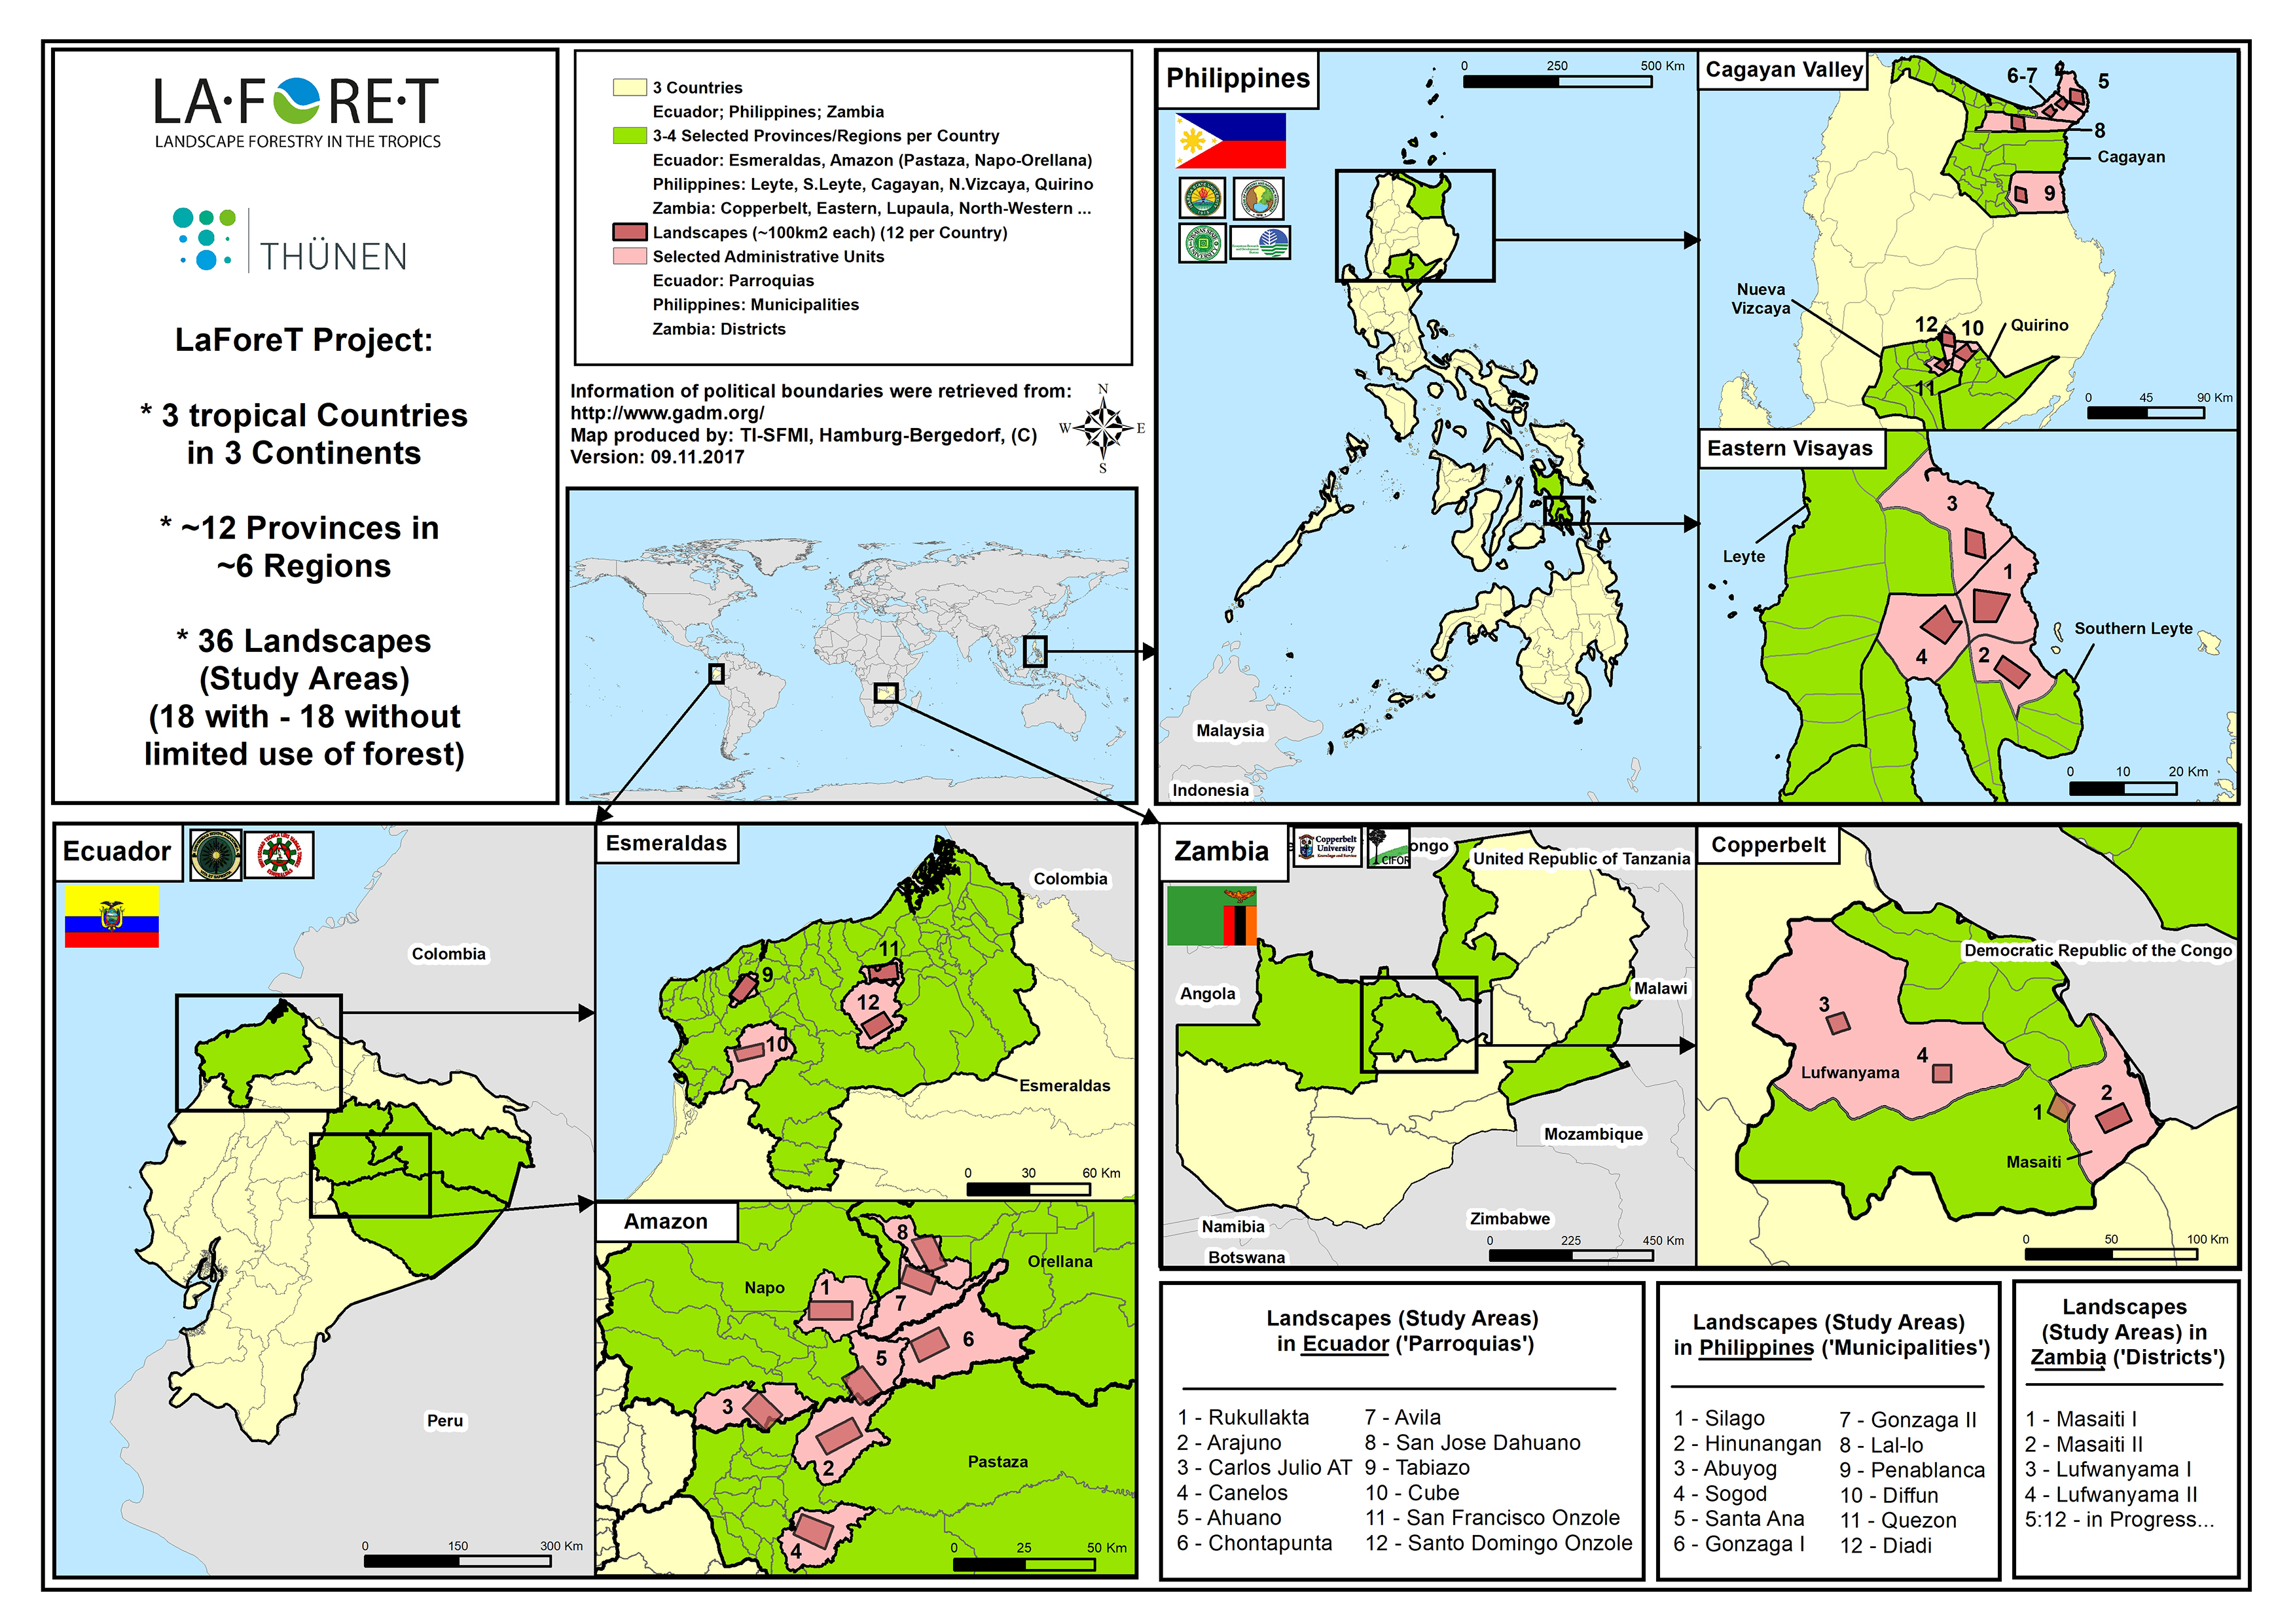 LaForeT Landscapes Overview Philippines